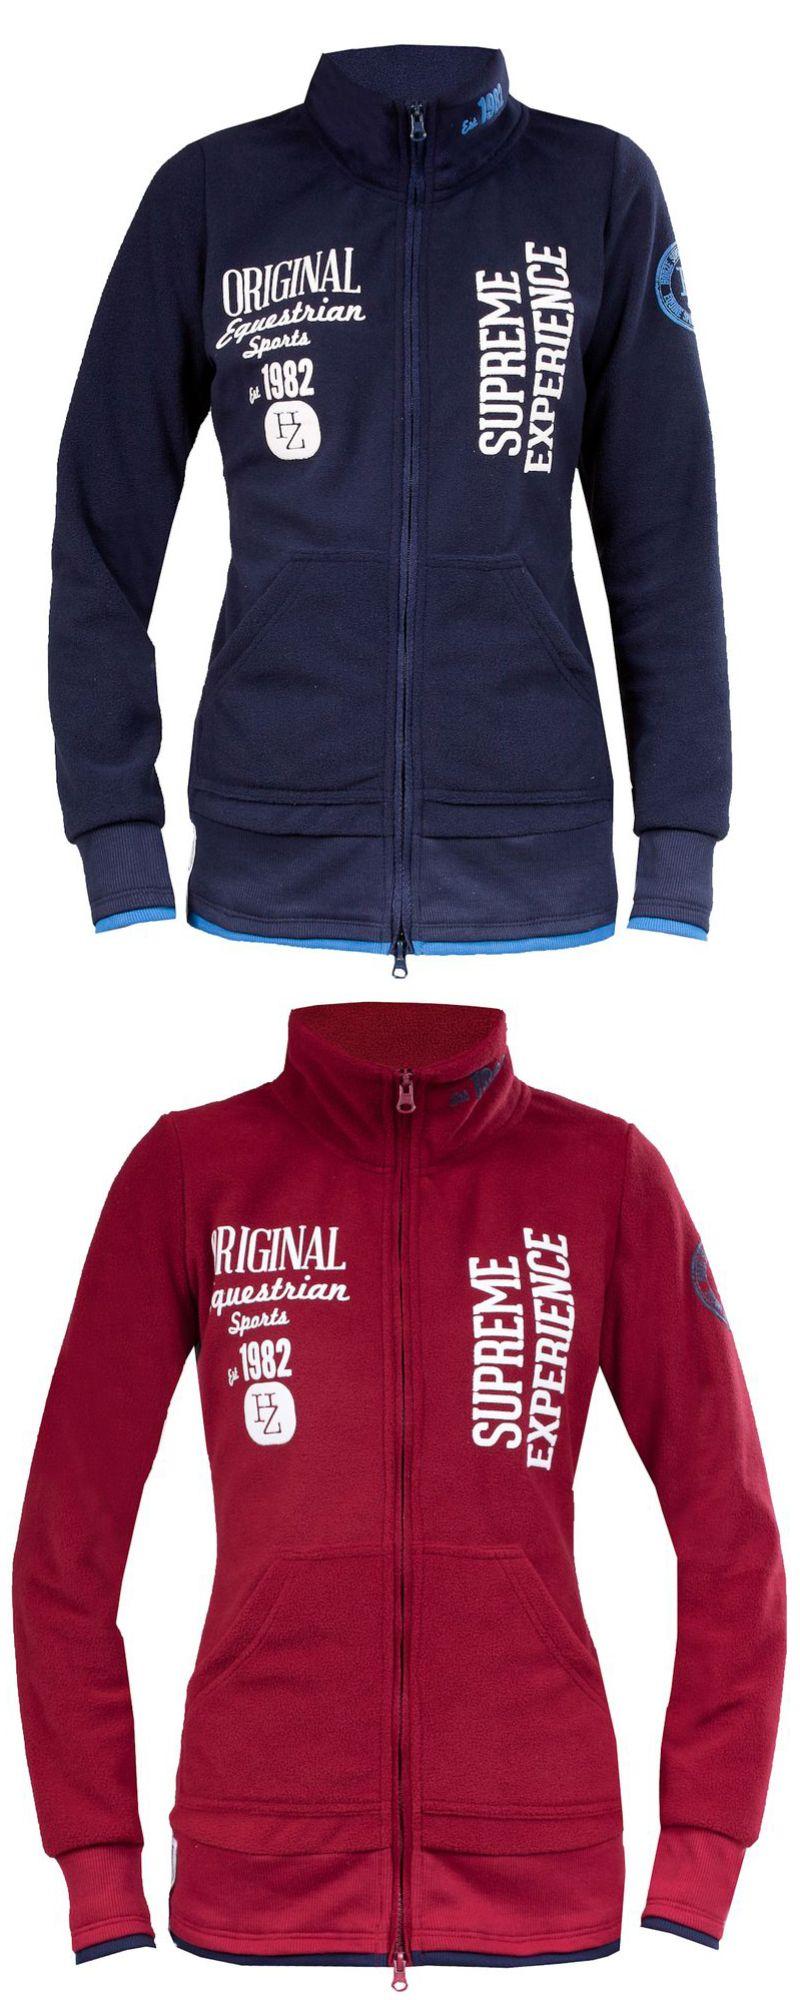 Horze doria fleece jacket a soft fleece jacket with horze logo